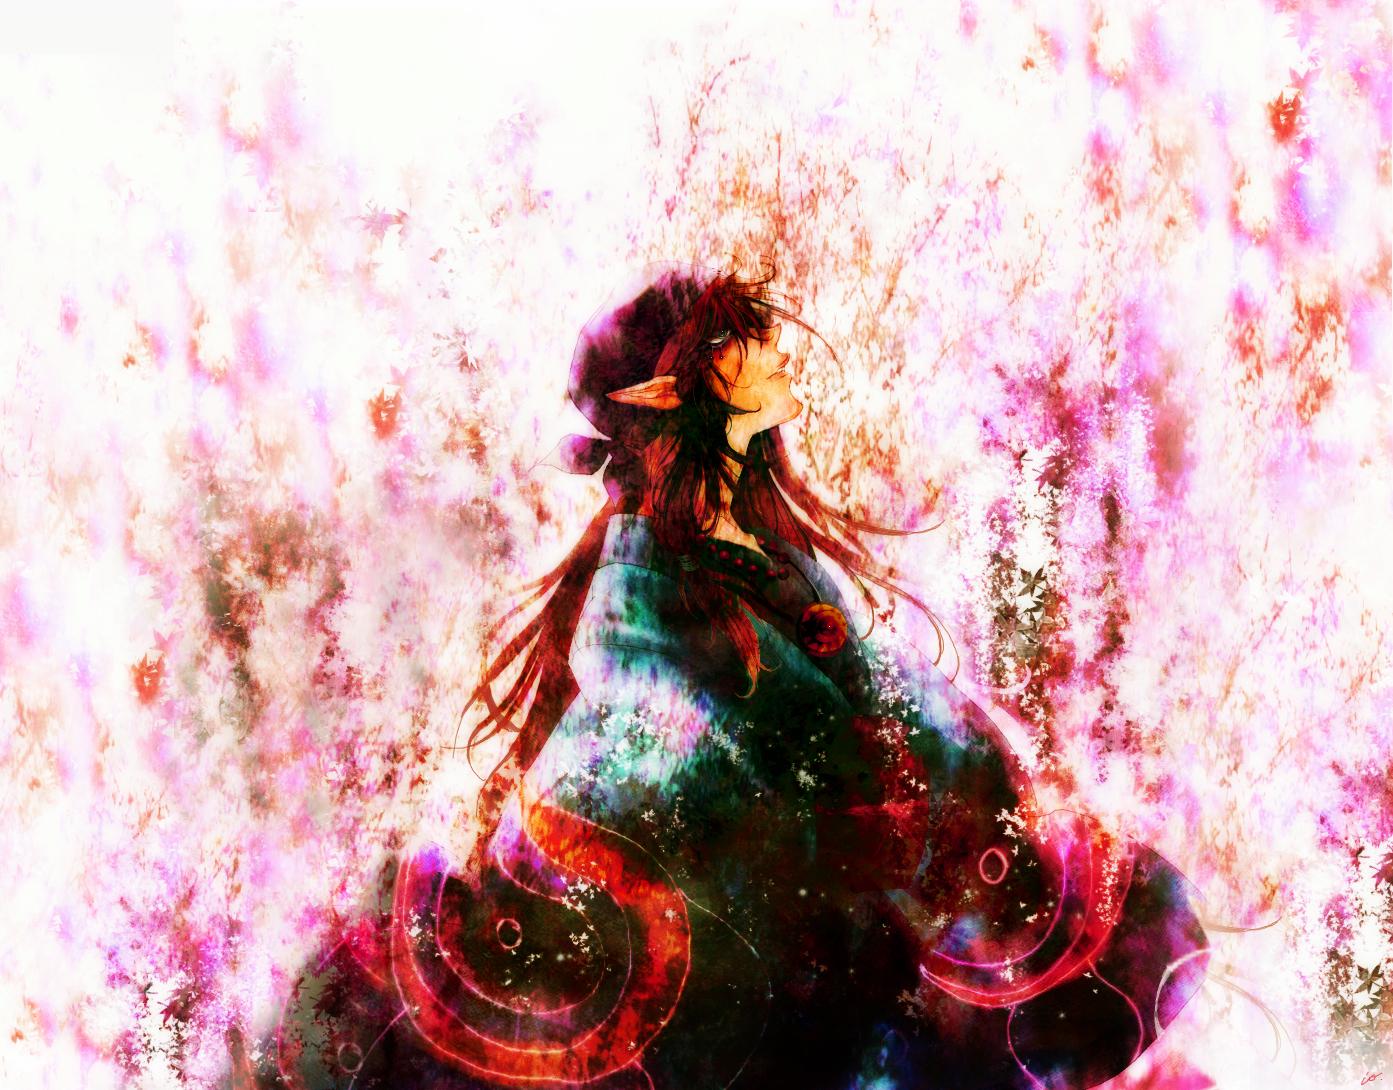 Mononoke wallpaper and background image 1393x1090 id - Mononoke anime wallpaper ...